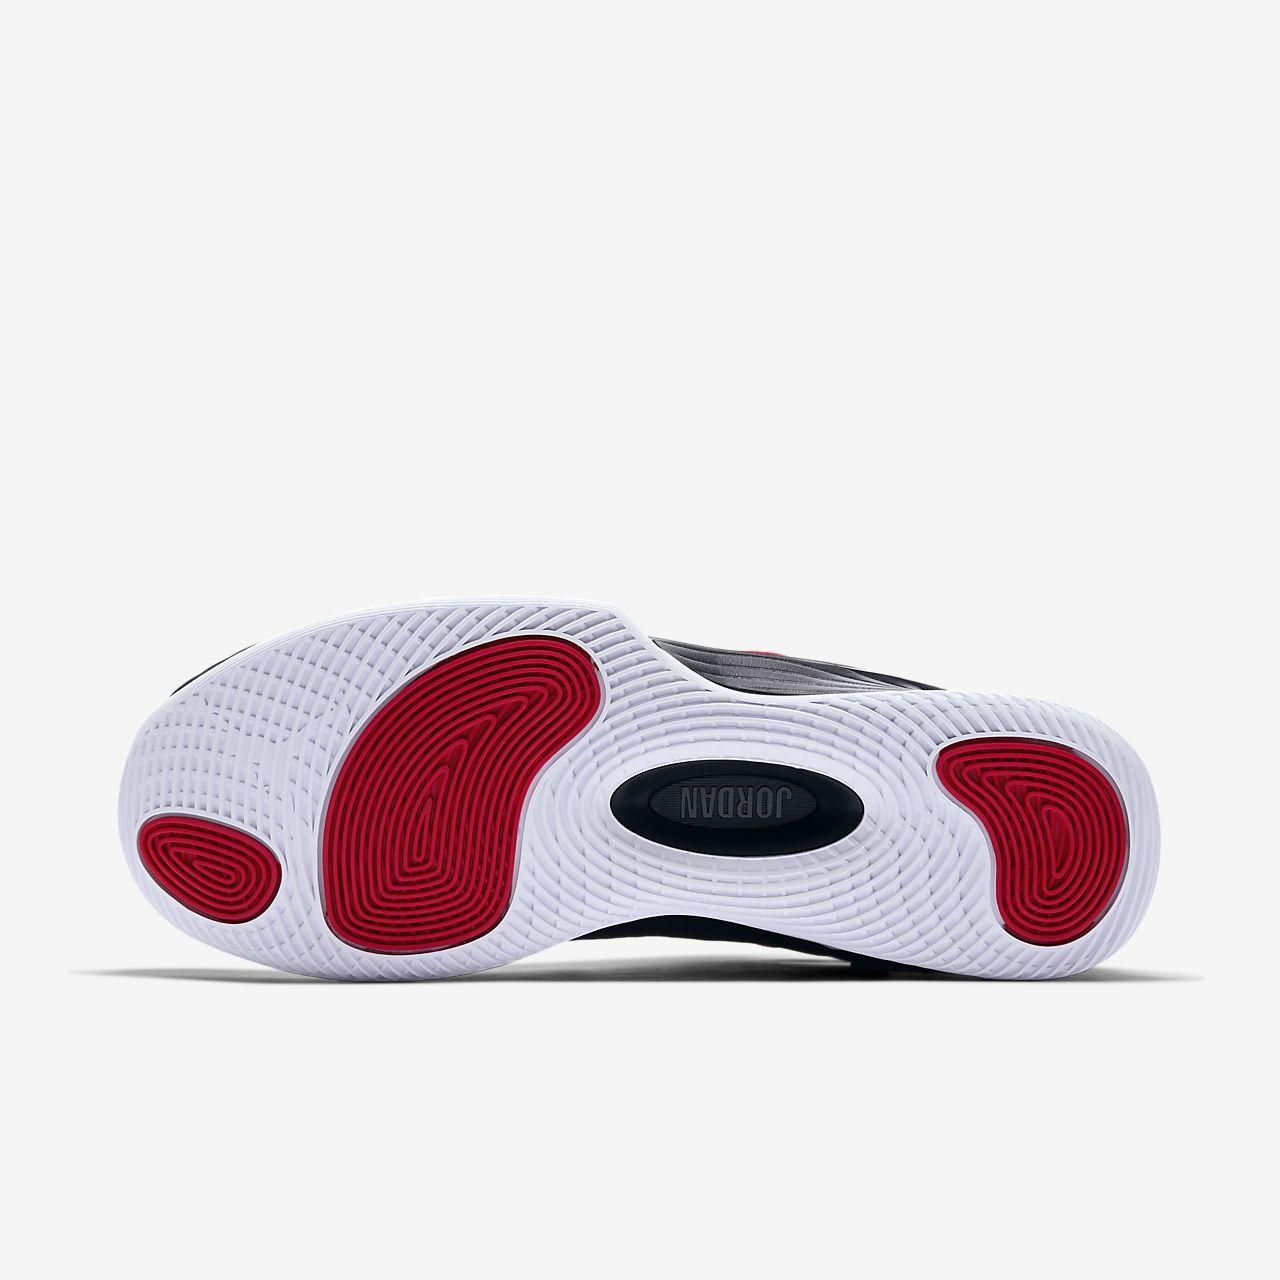 Jordan Ultra Fly 2 Low Low Low Herren-Basketballschuh    | Professionelles Design  b448ea